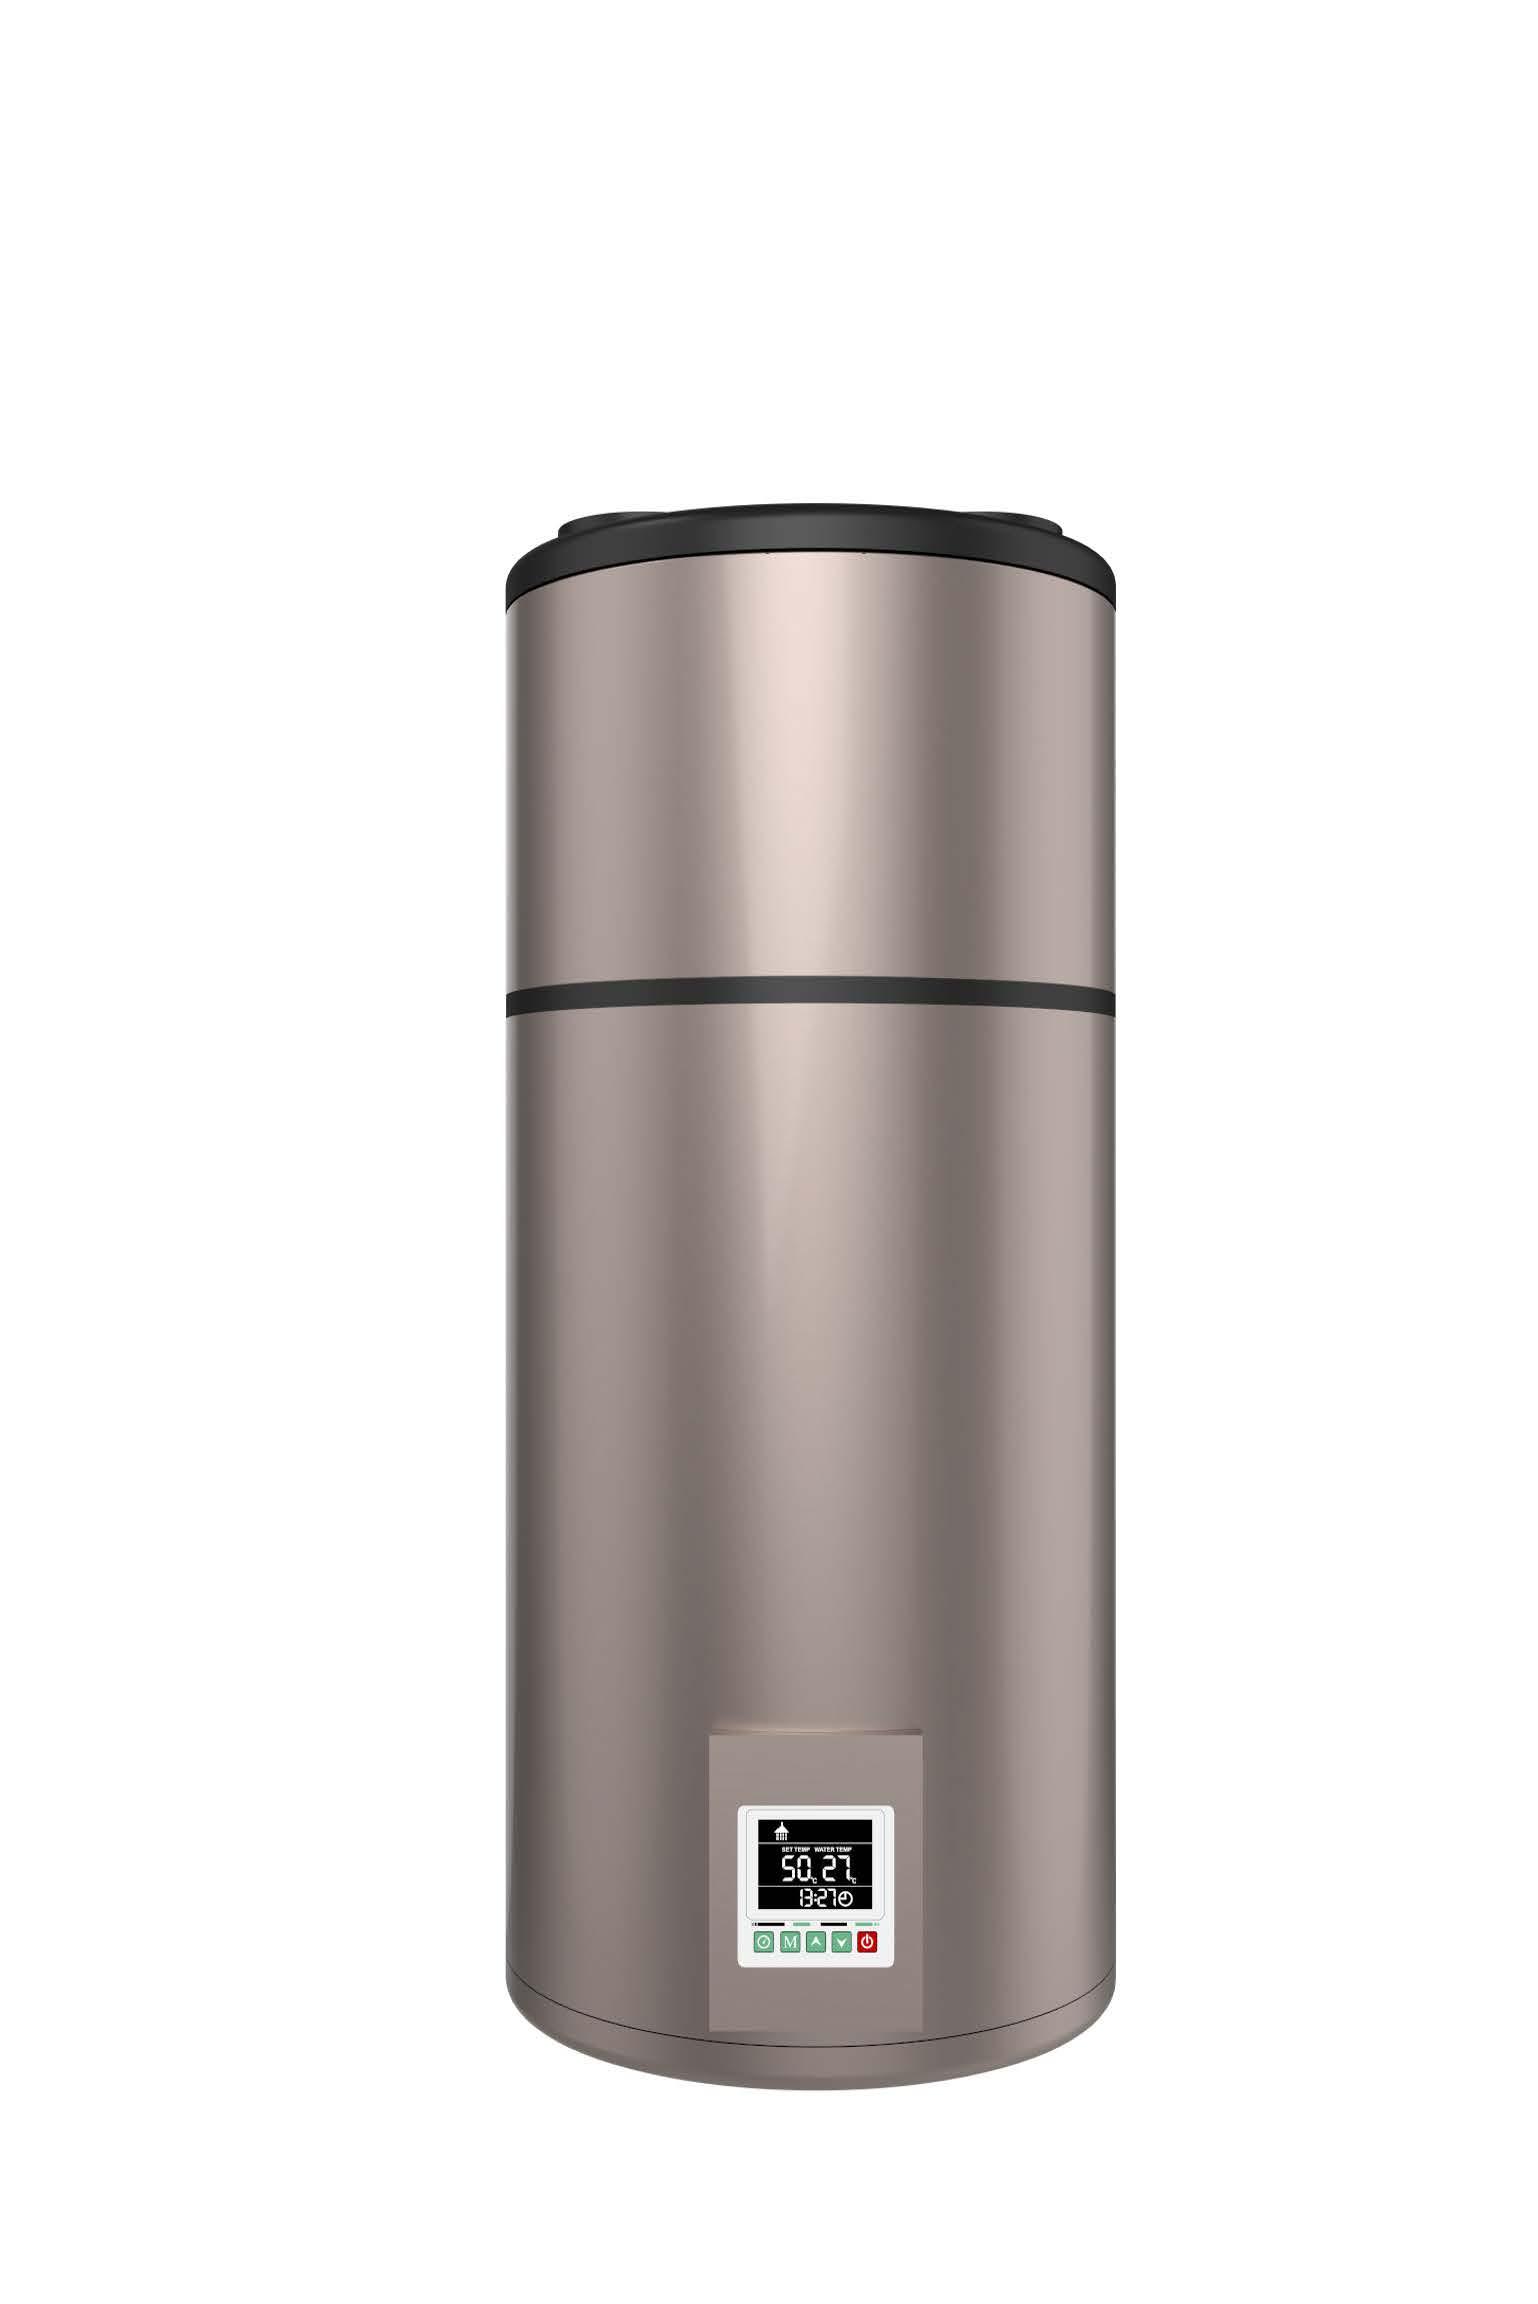 Domestic Hot Water Heat Pump Water Heater